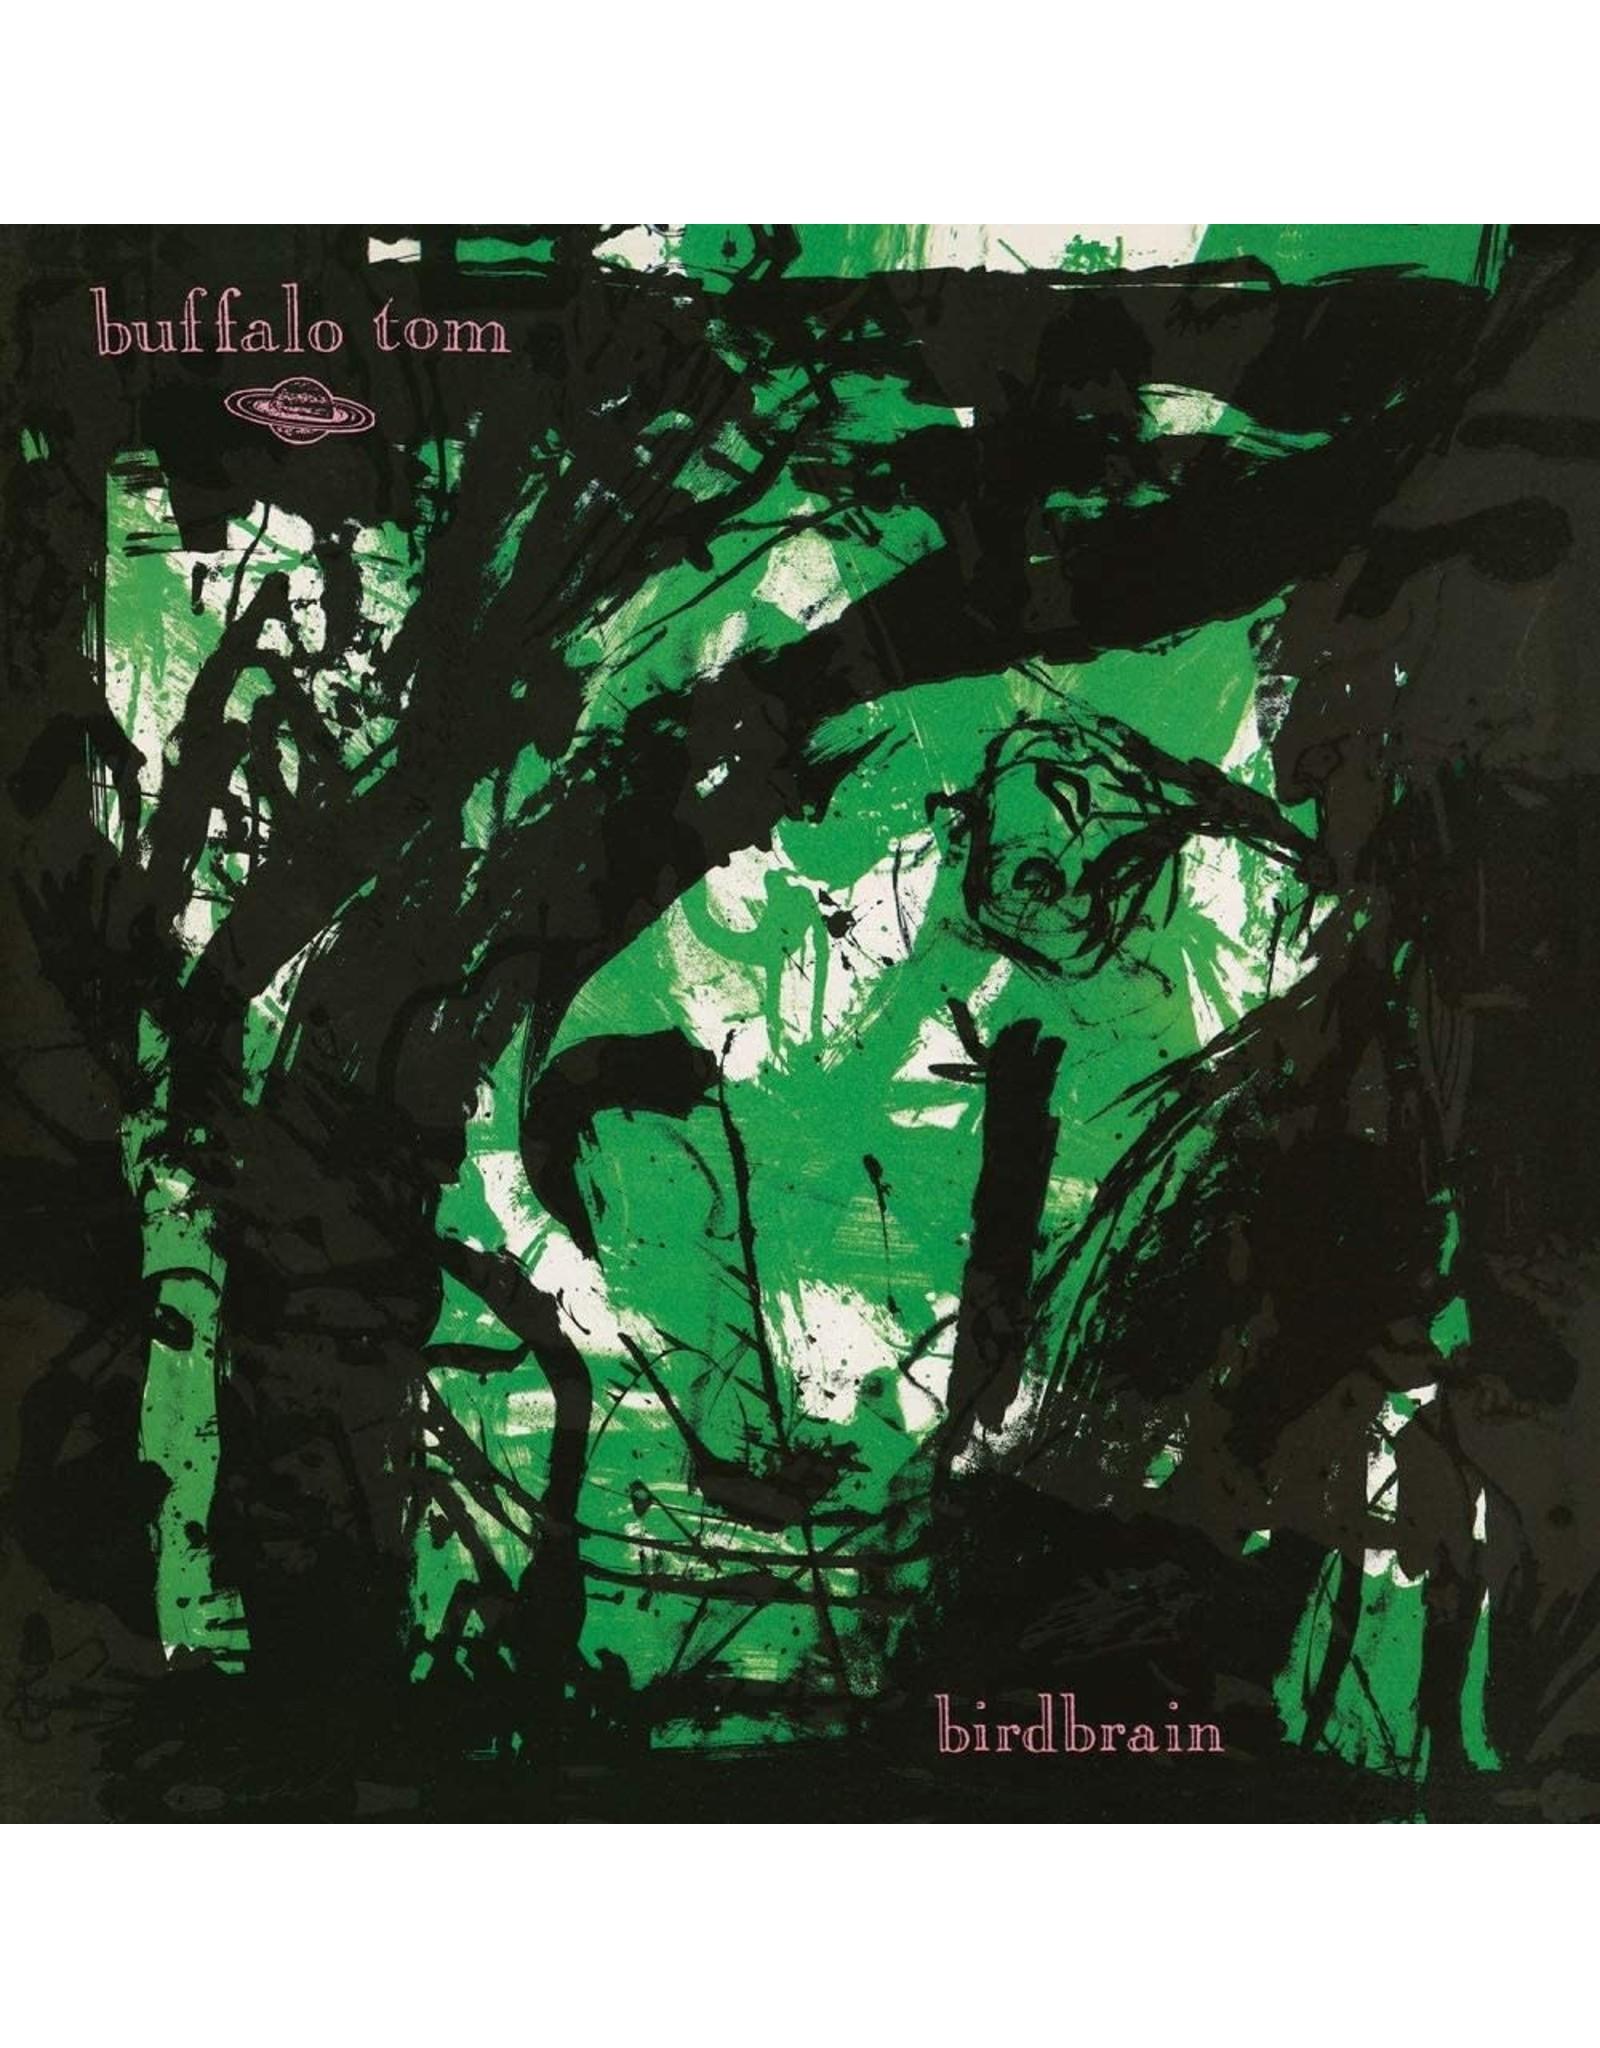 Buffalo Tom - Birdbrain (Mint Green Vinyl)